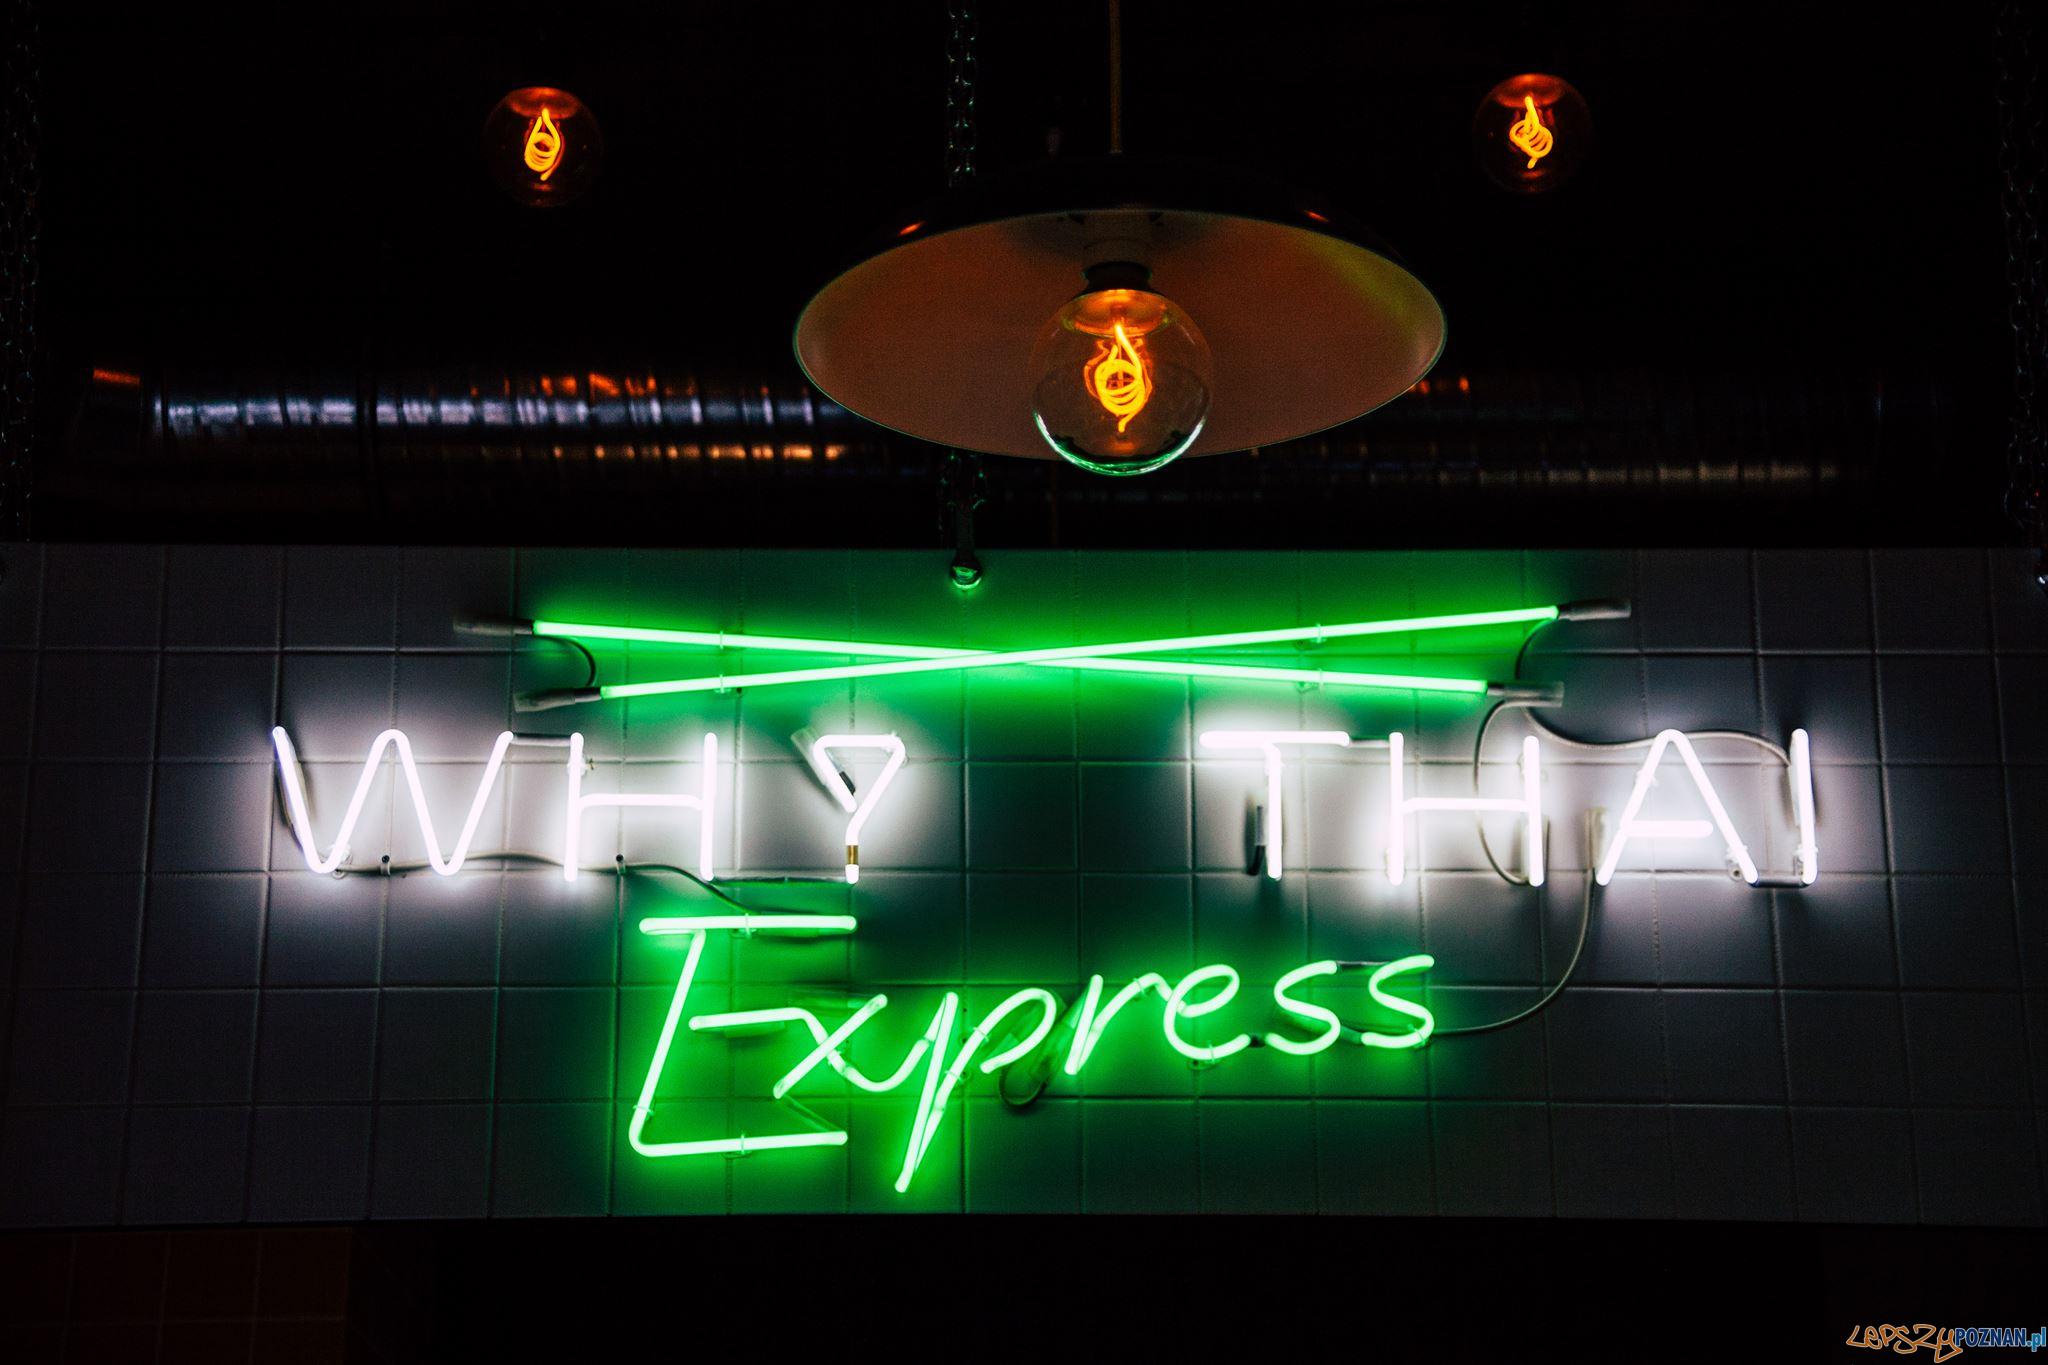 Why Thai Express neon  Foto: materiały prasowe / monolite.pl